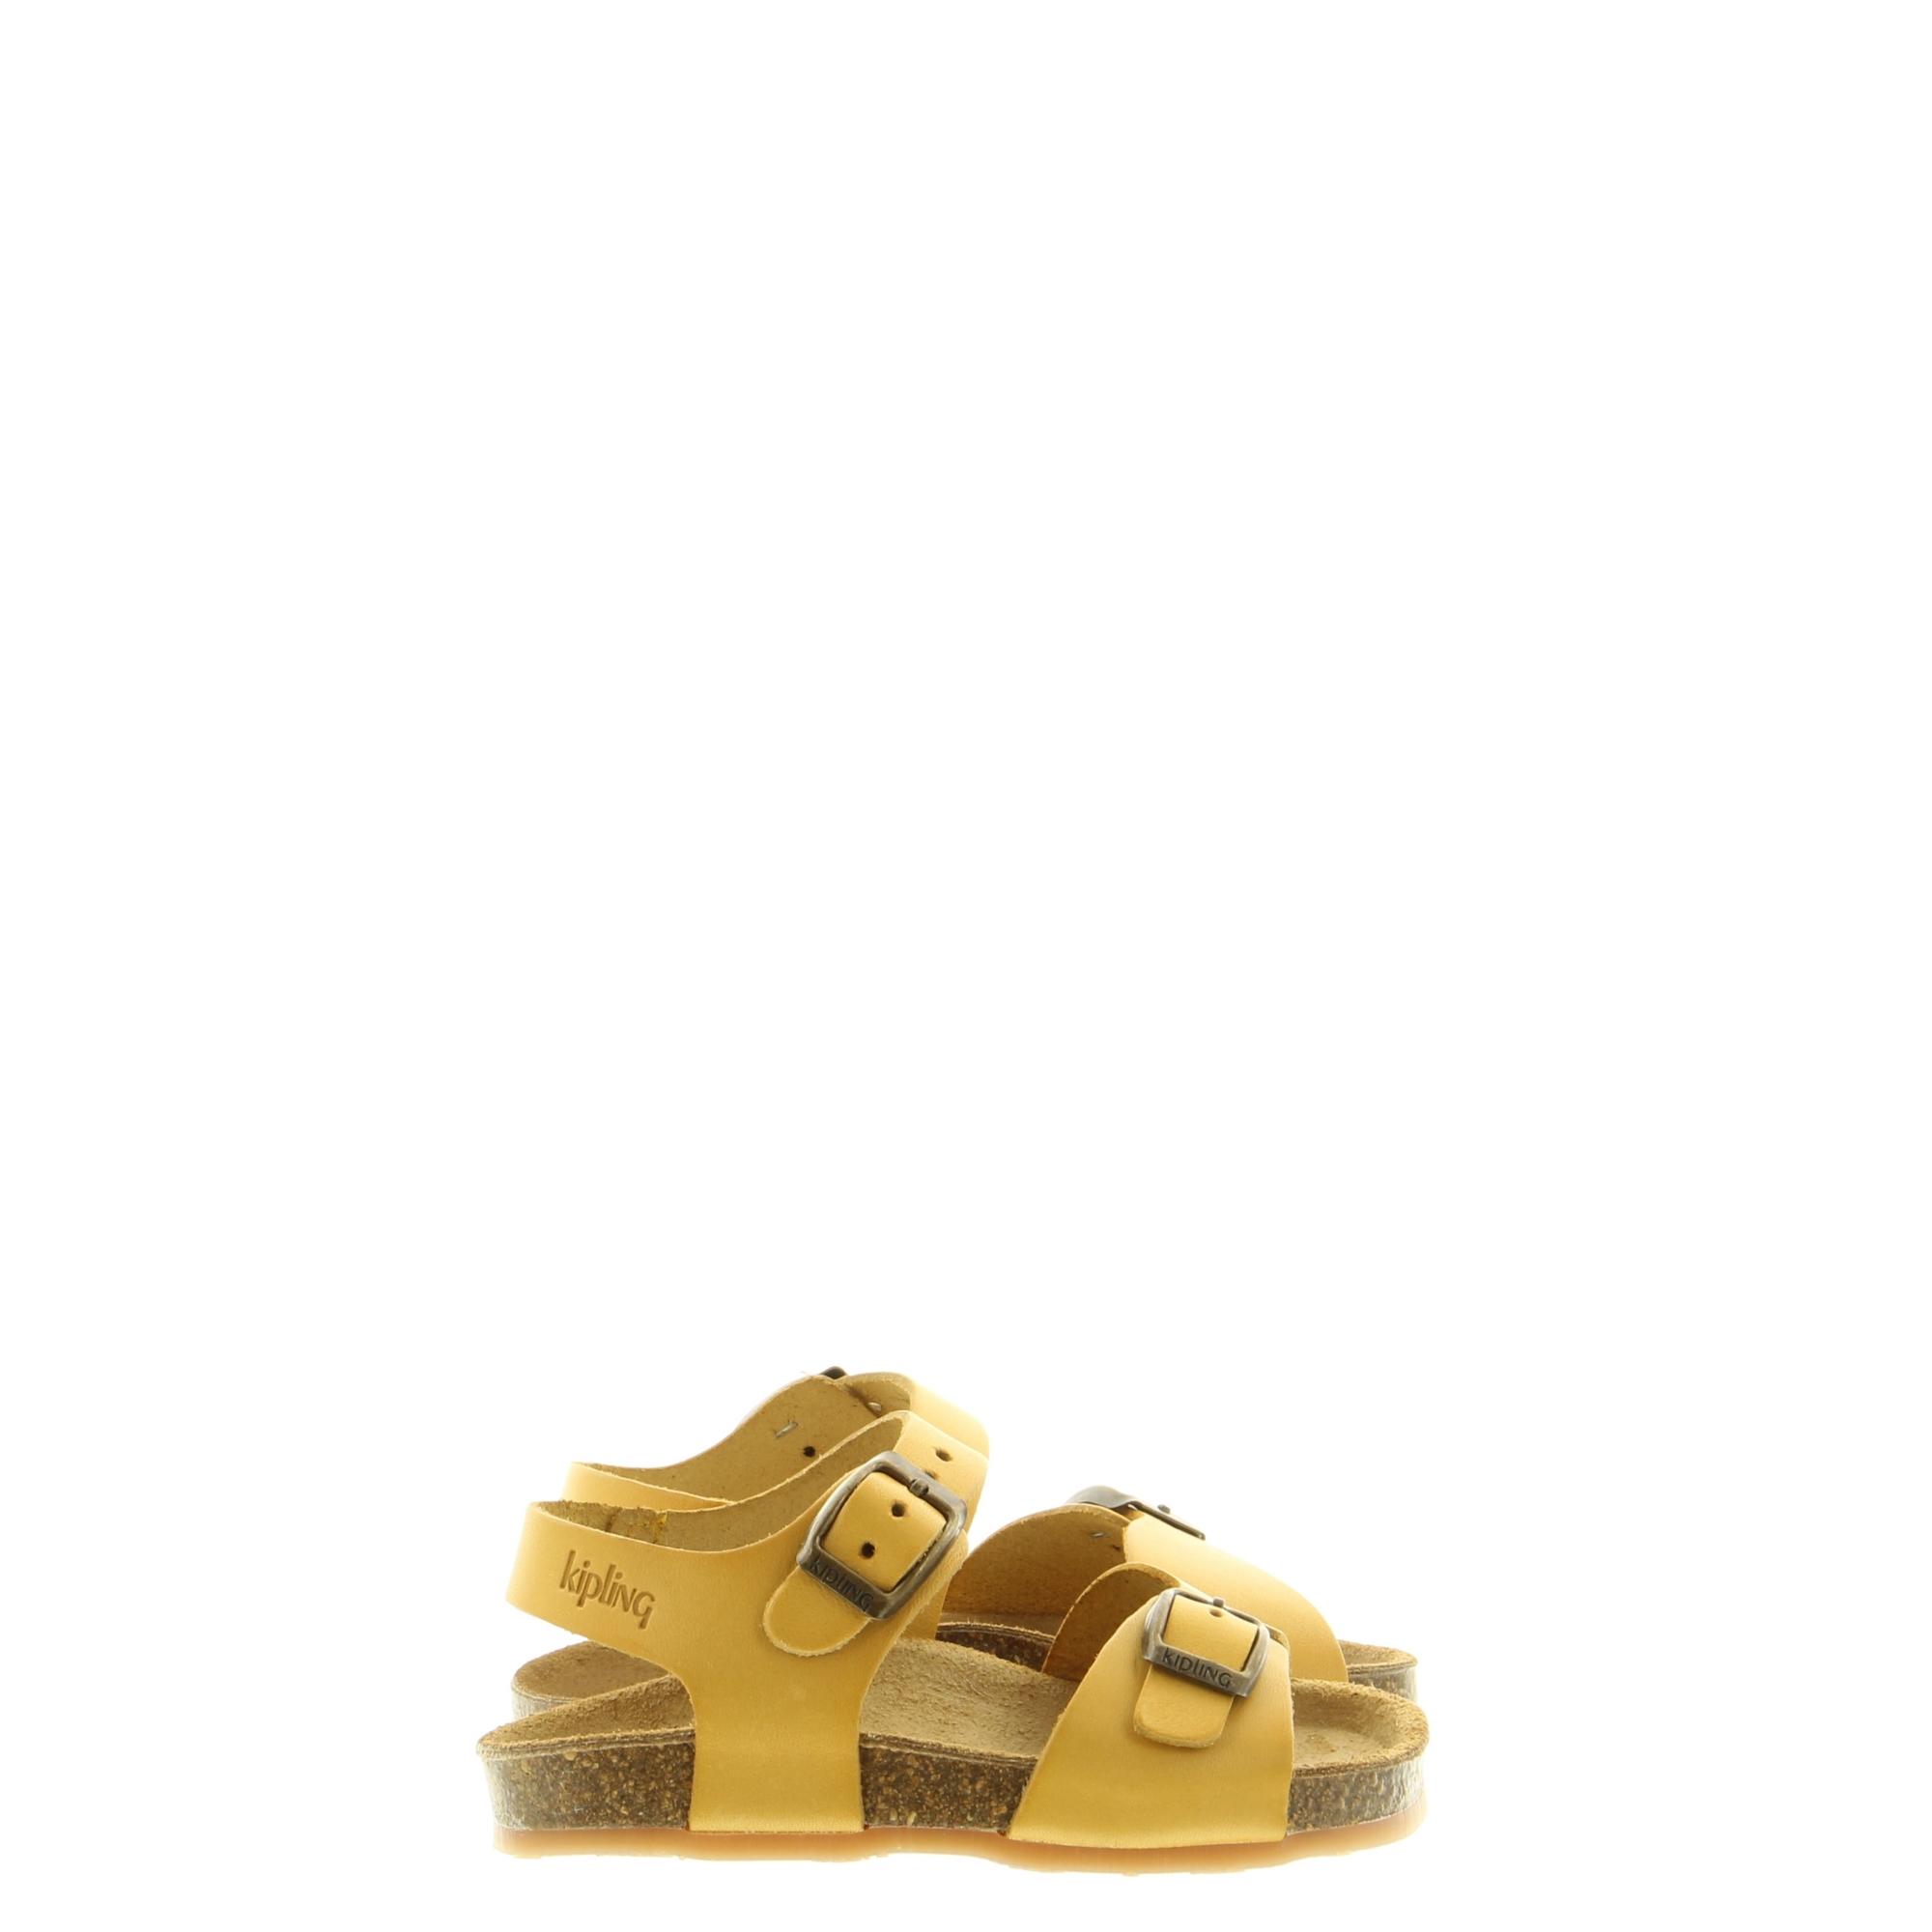 Kipling EASY 4 11965200 0300 yellow